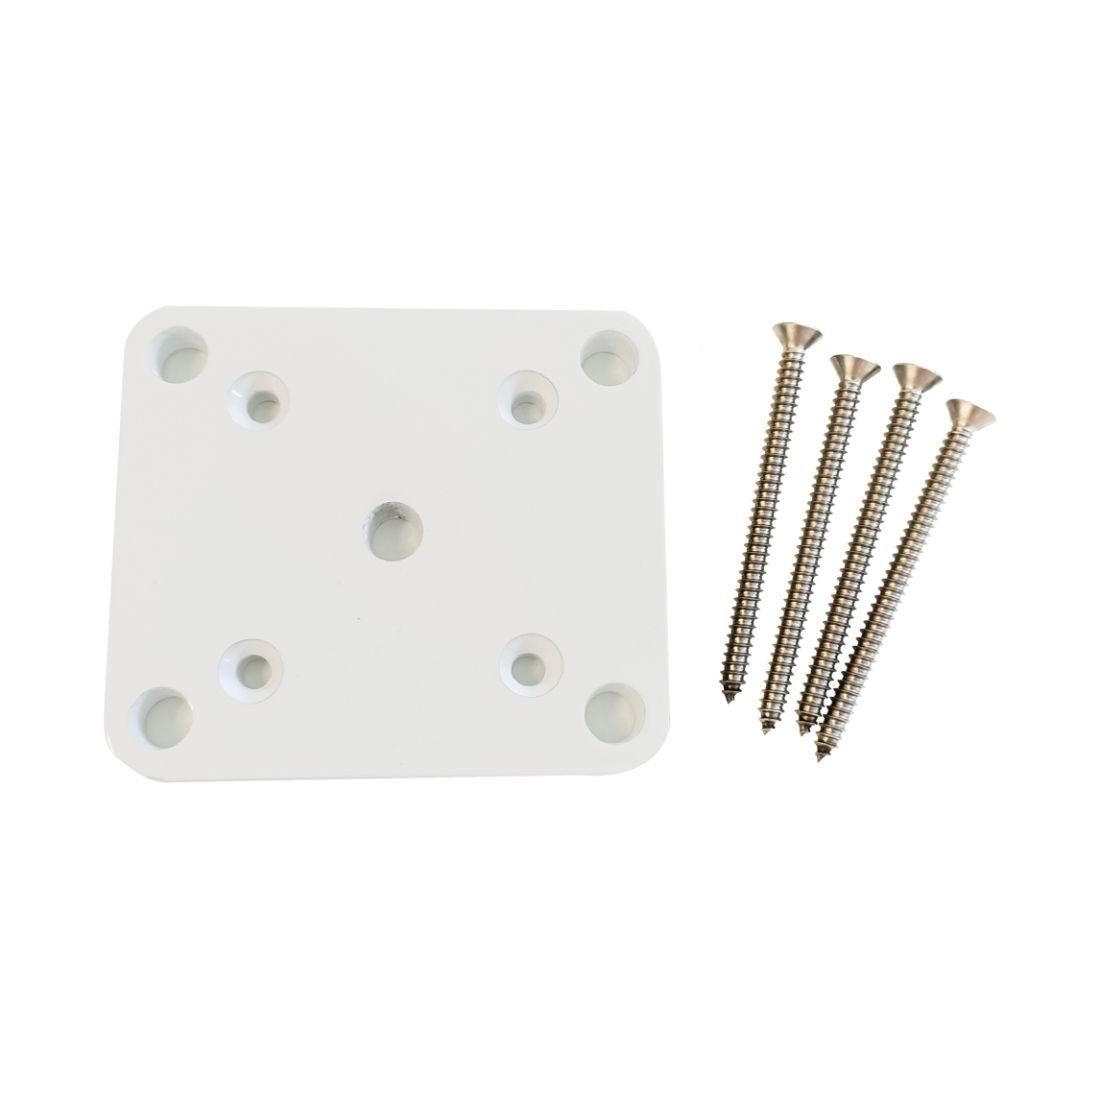 Base Plate Set White 50 x 50mm ELI-BASE-WHT-PLT50